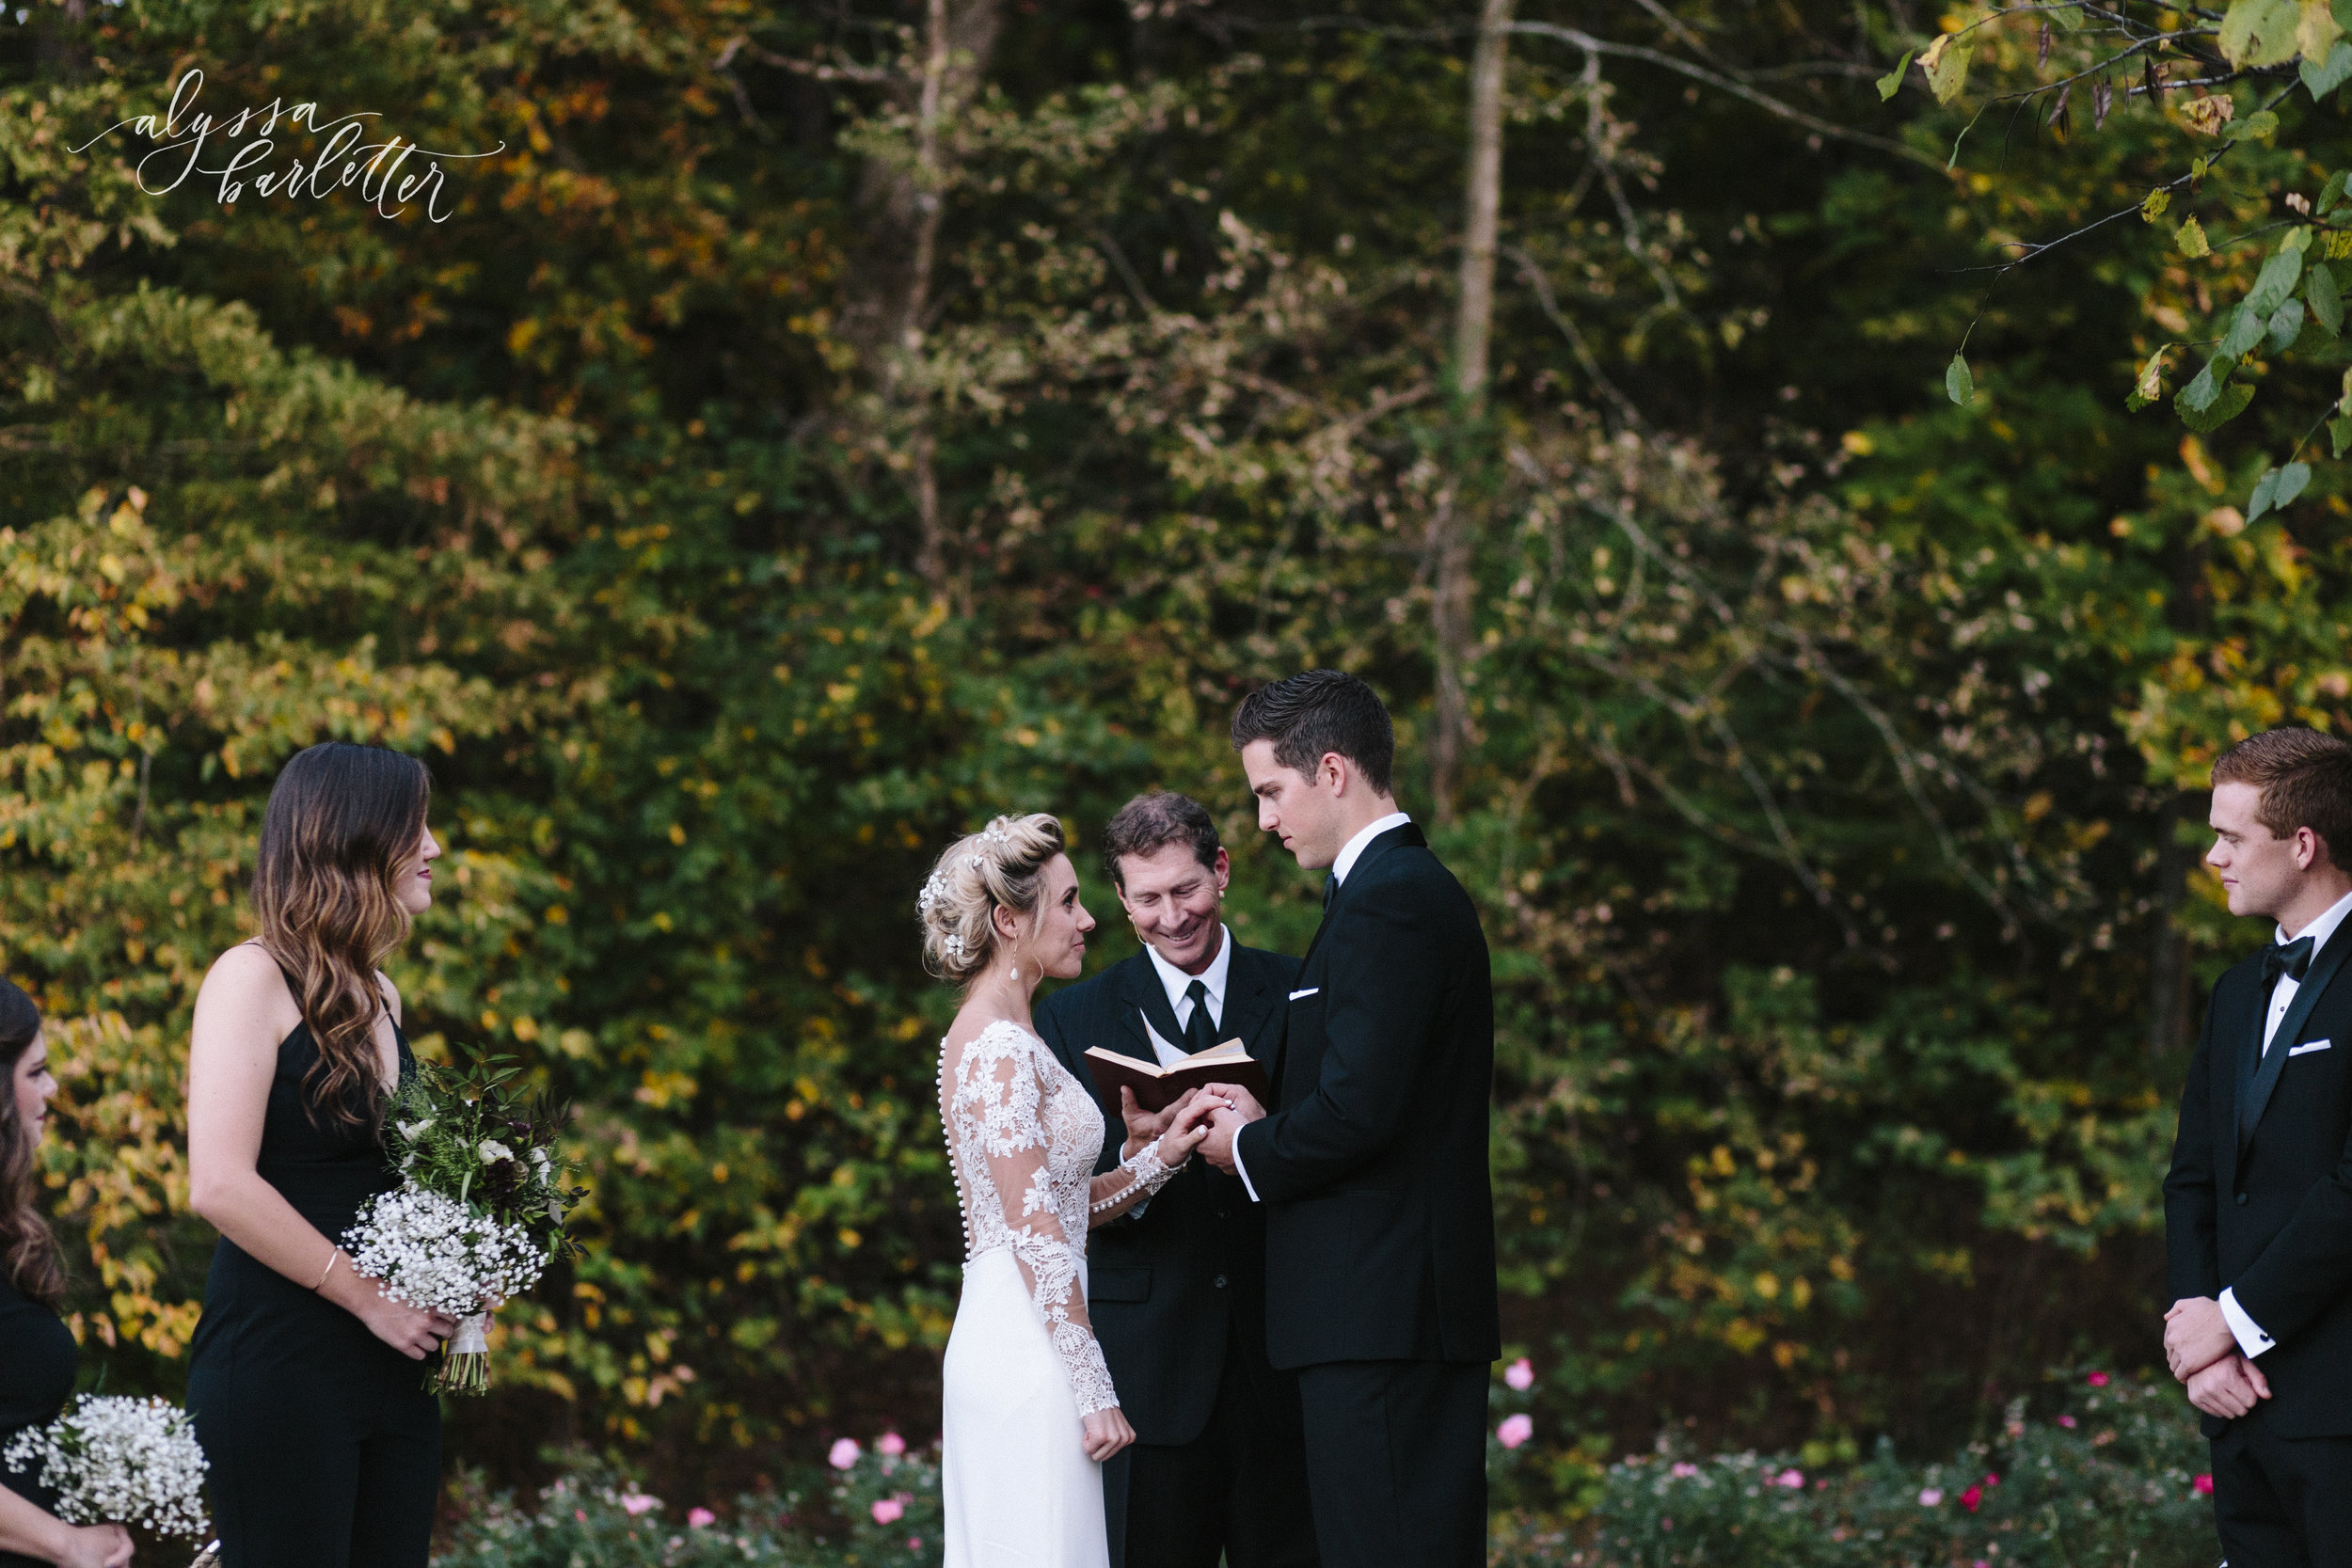 alyssa barletter photography fayetteville arkansas wedding photos micah and colin-1-46.jpg